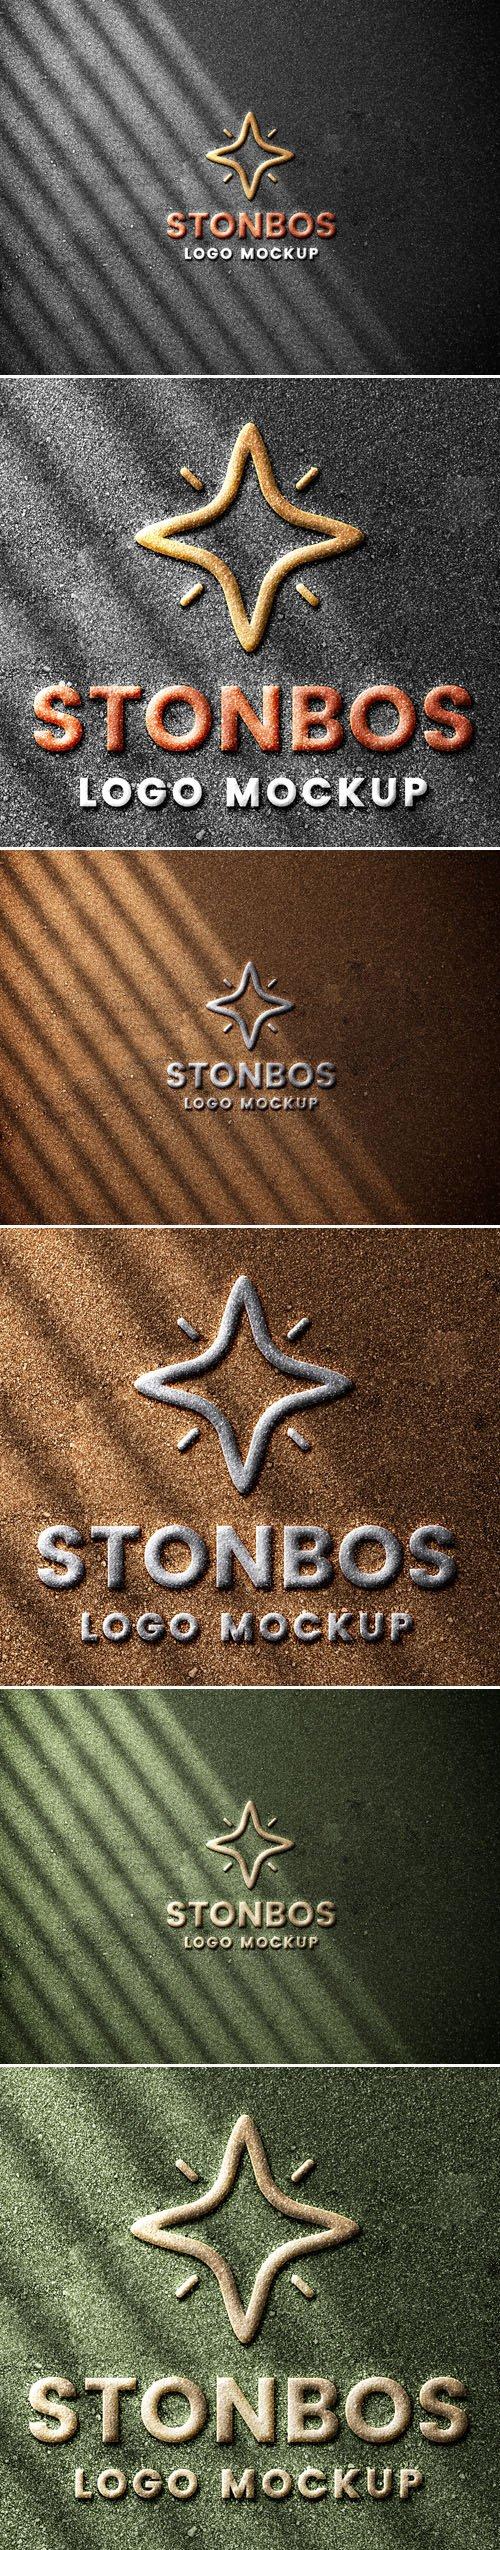 Stonebos Logo PSD Mockup